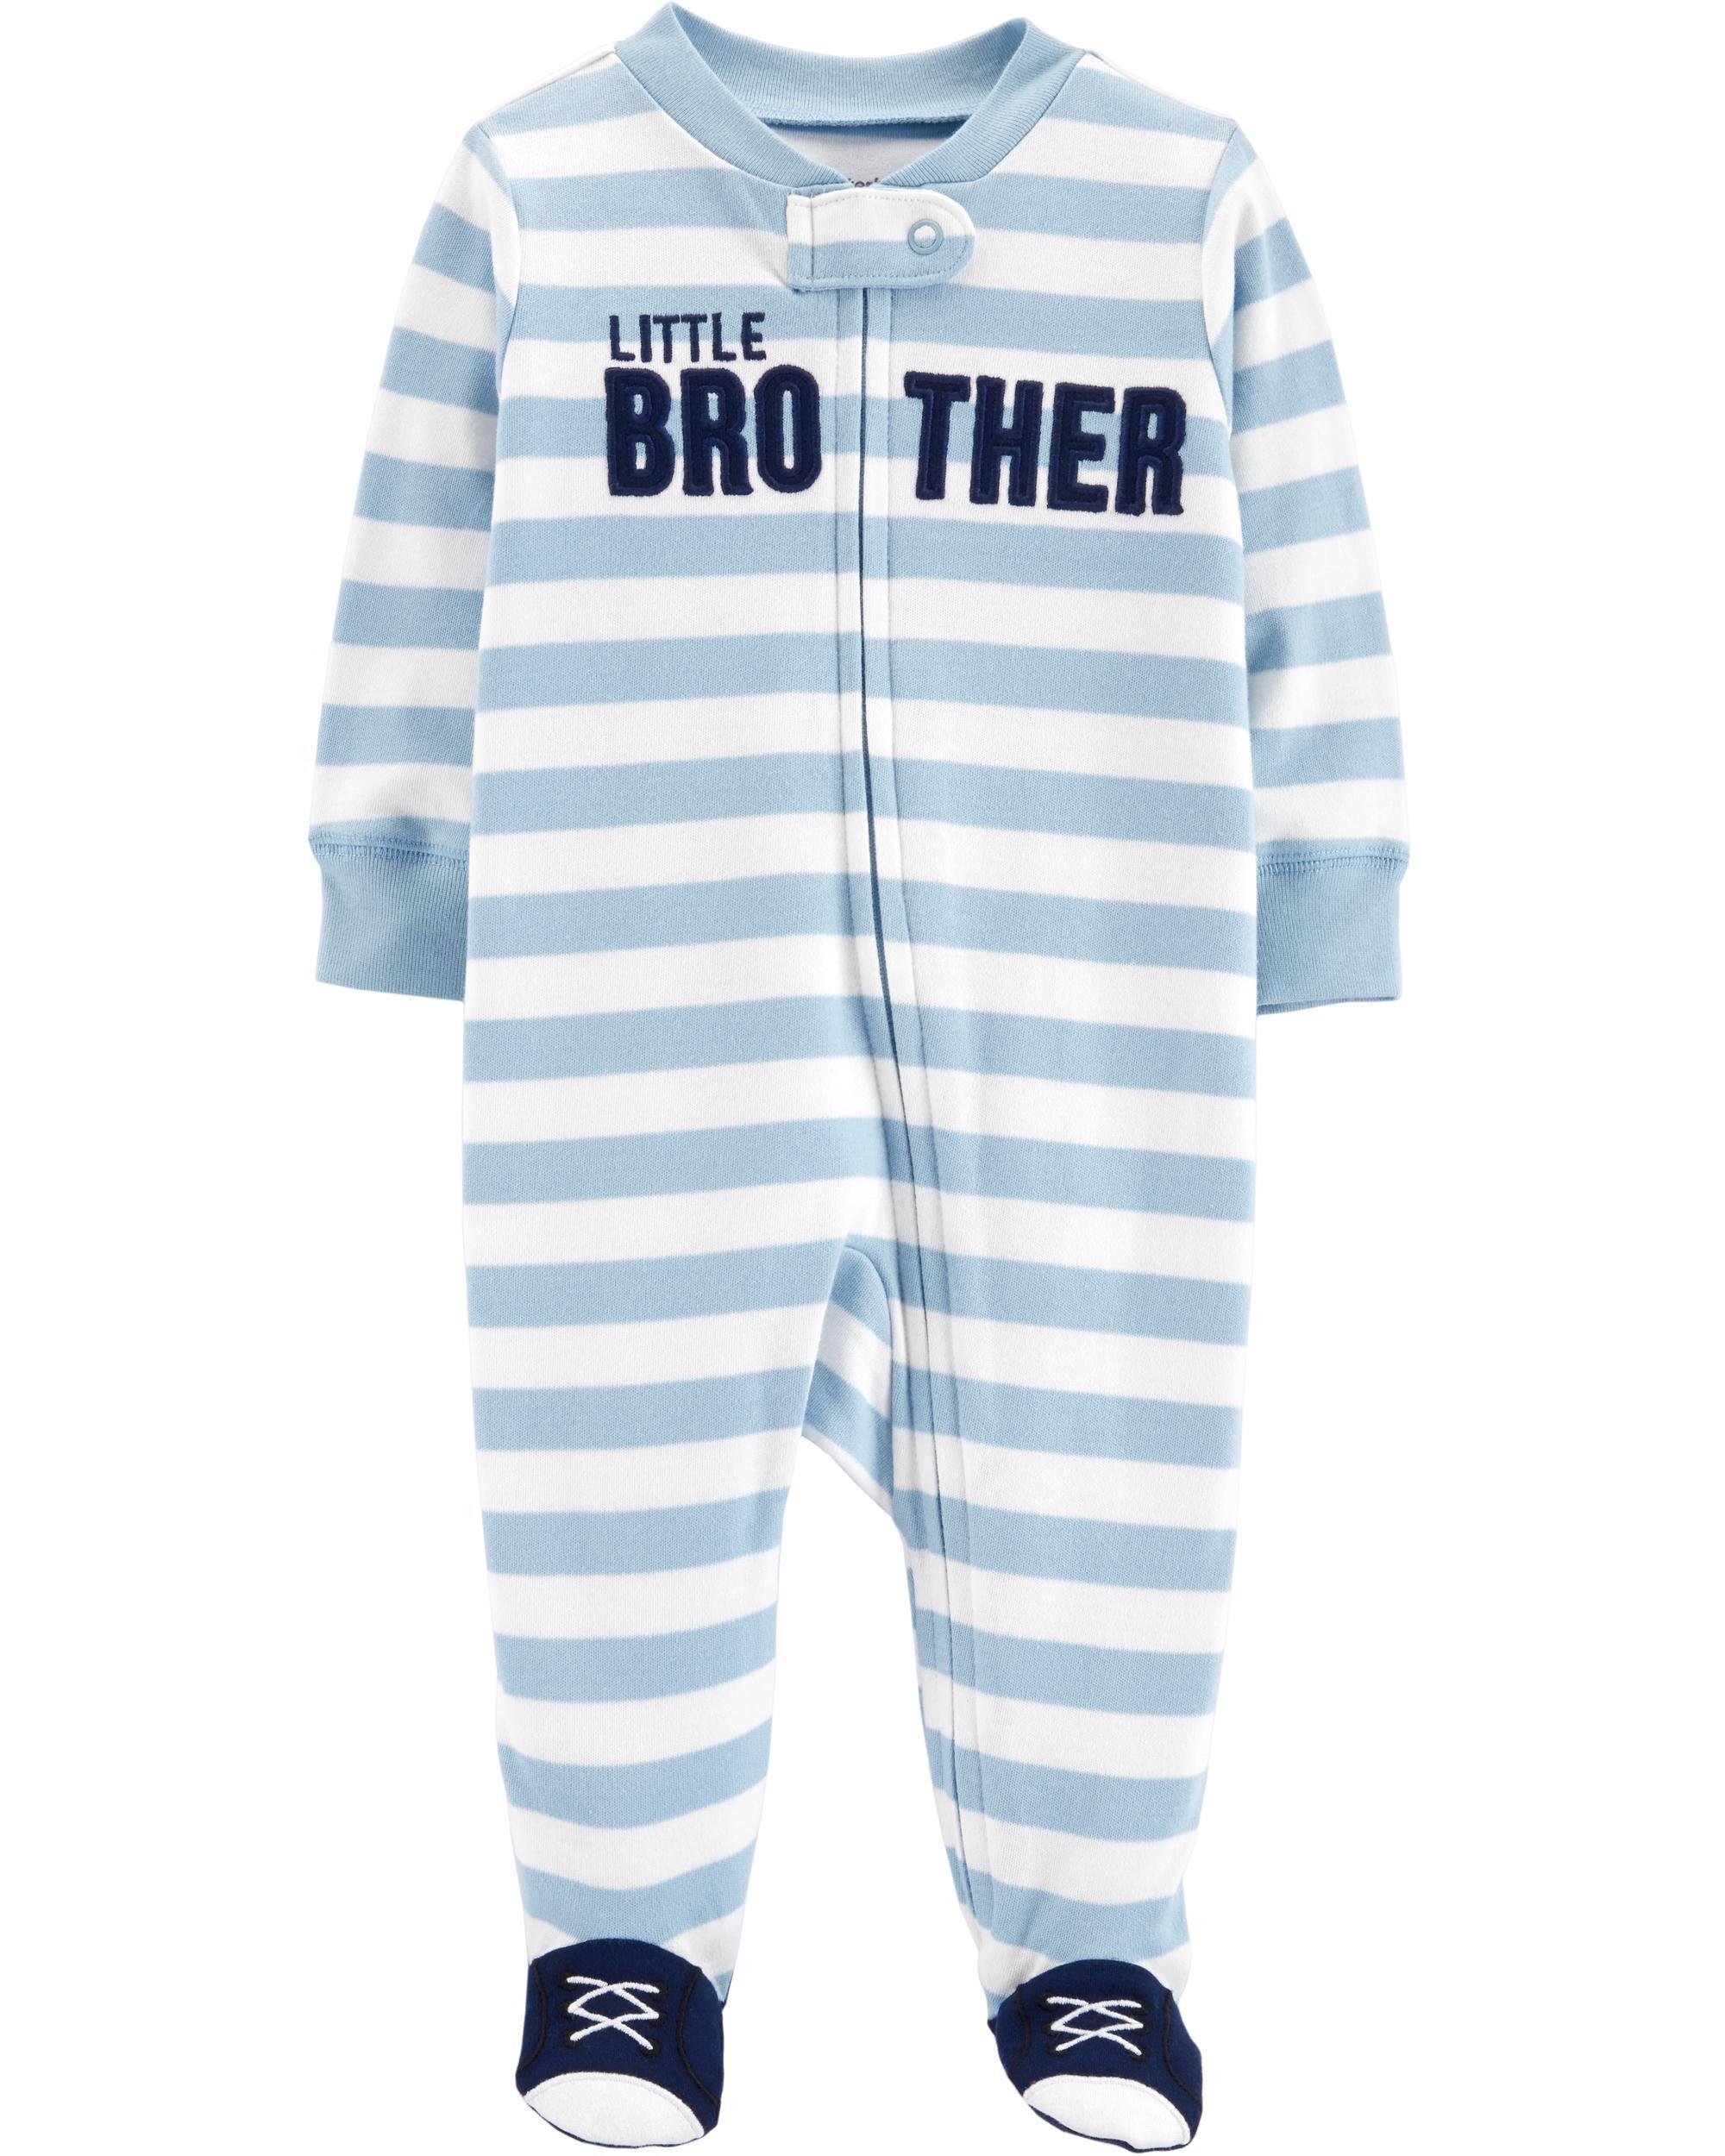 598ecfc12 Little Brother Zip-Up Cotton Sleep & Play | Carters.com